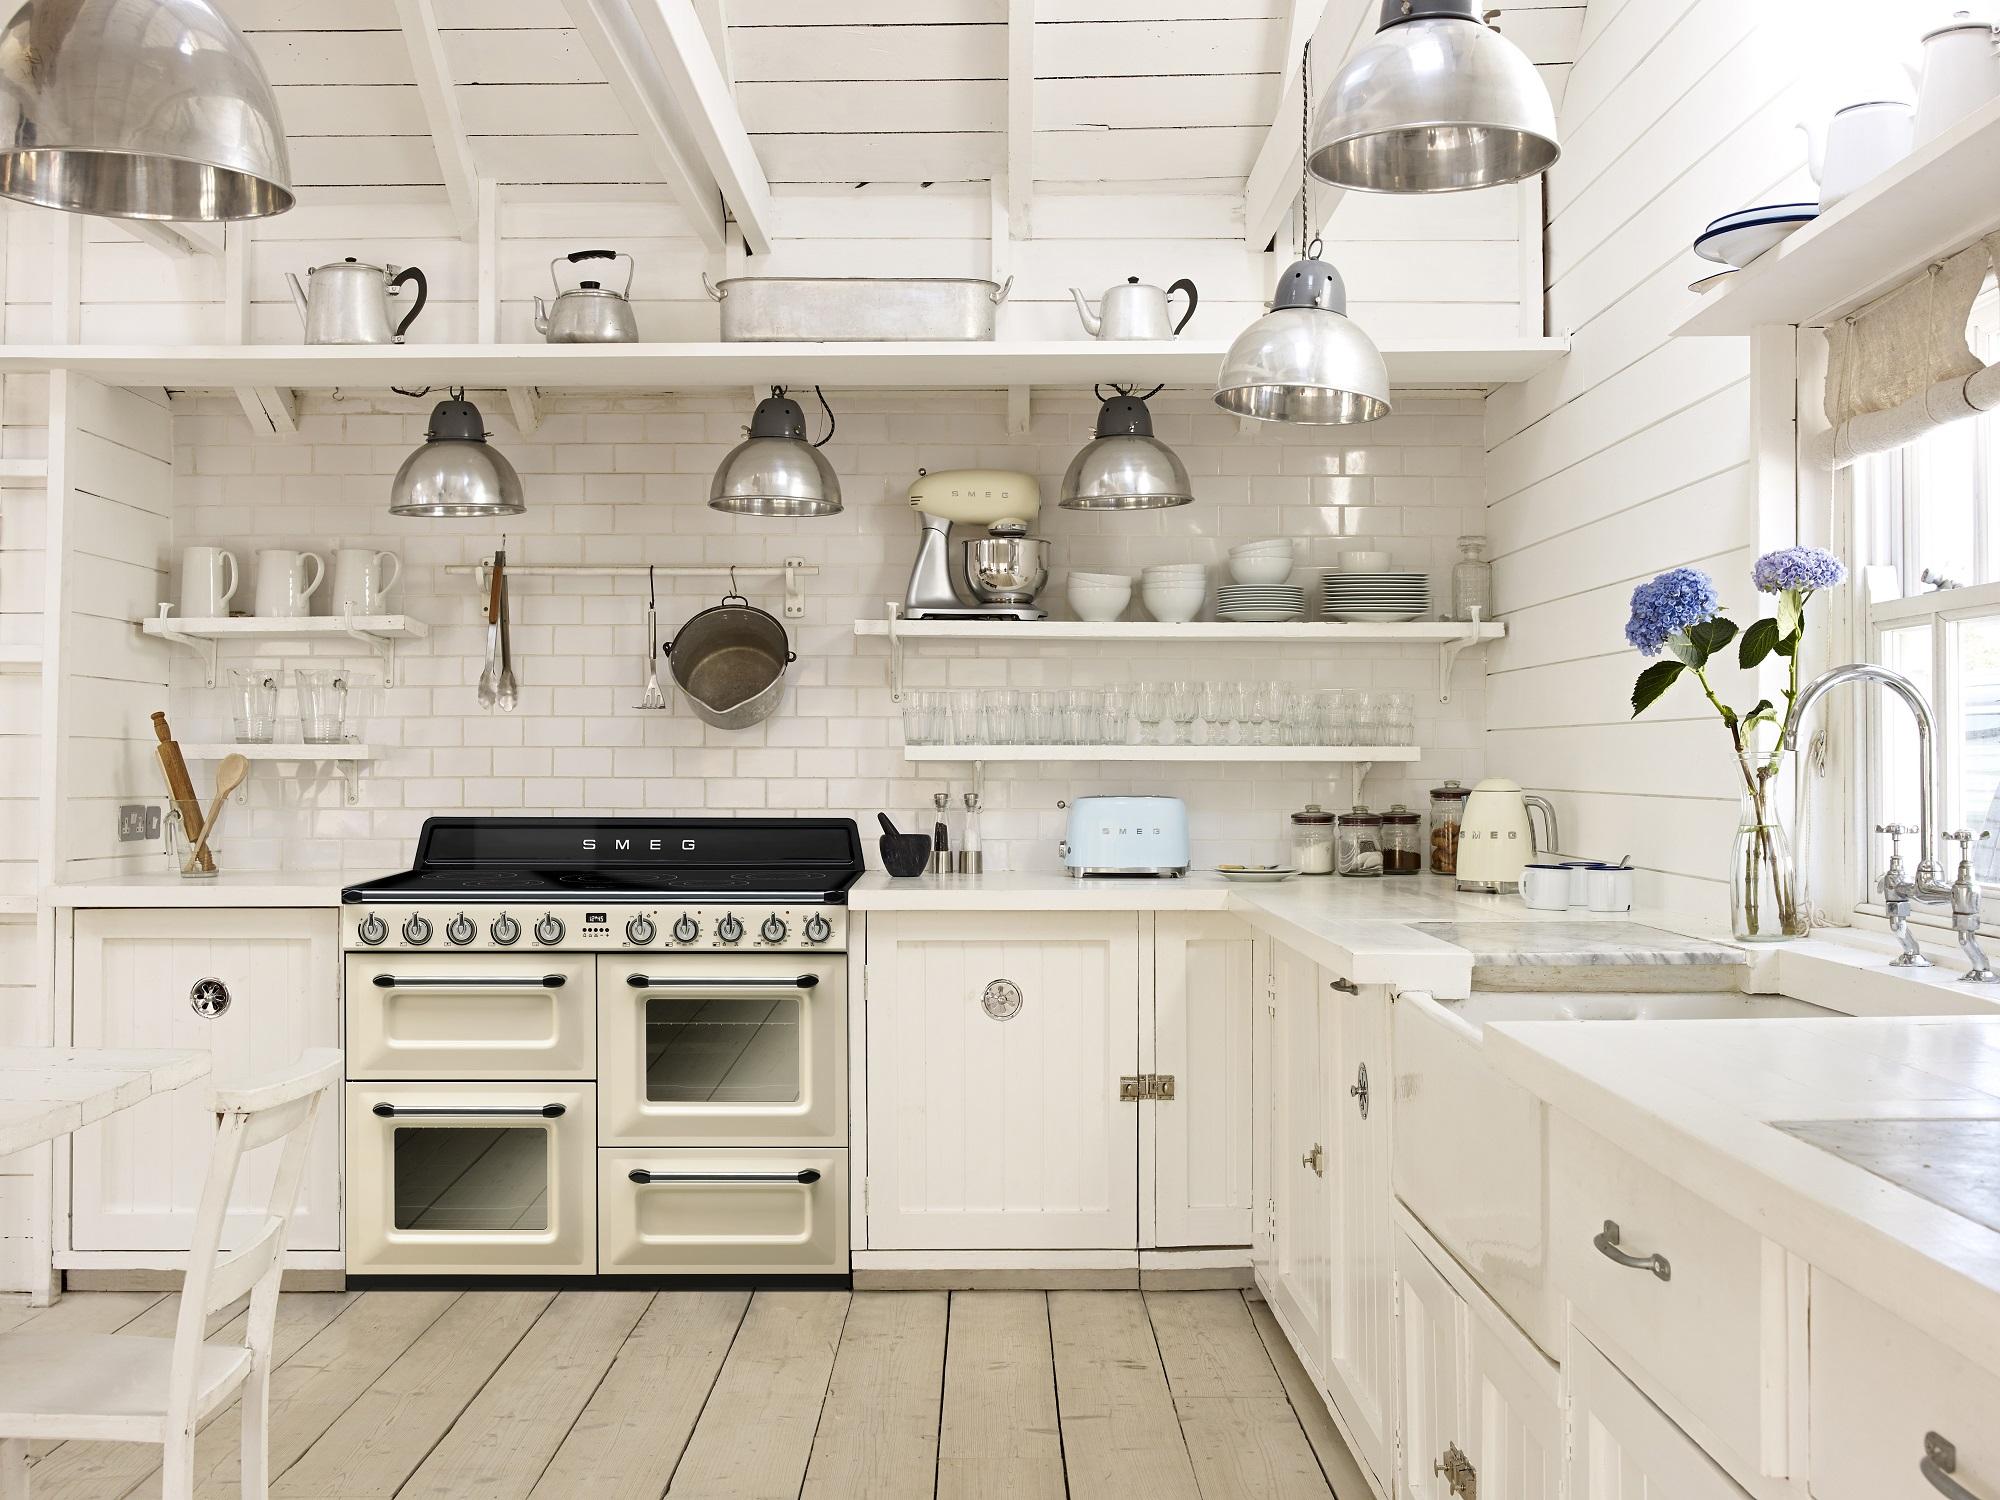 Retro Keukenapparatuur : Keuken met Smeg fornuis en klein huishoudelijke apparatuur van Smeg in